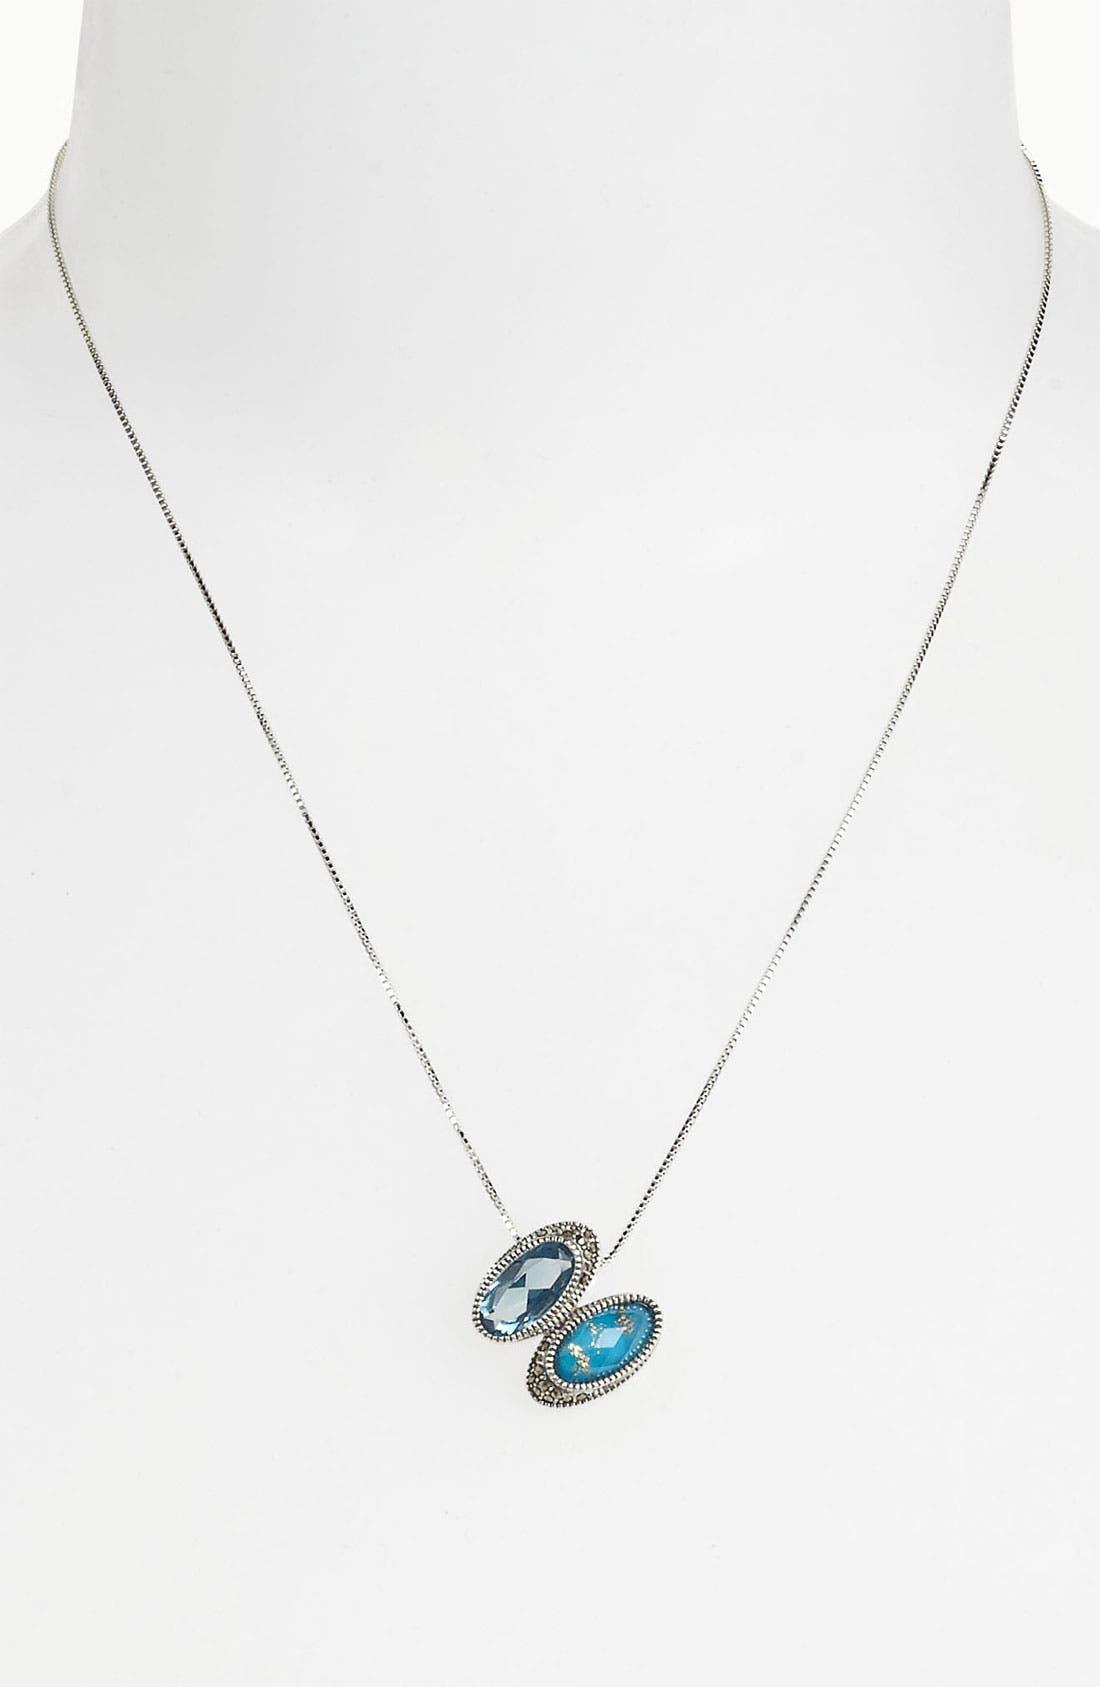 Main Image - Judith Jack Pendant Necklace